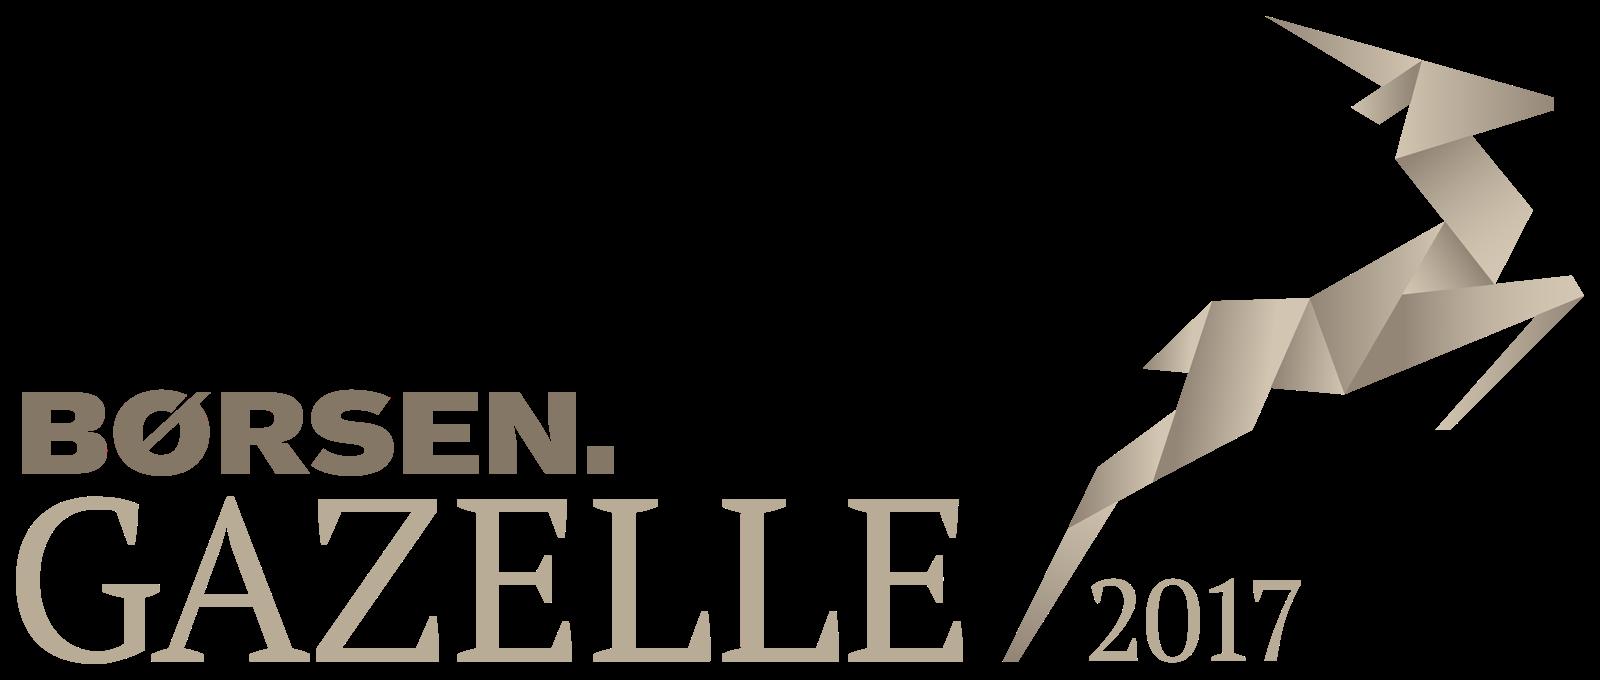 Gazelle-2017_rgb_negativ_transparent.png